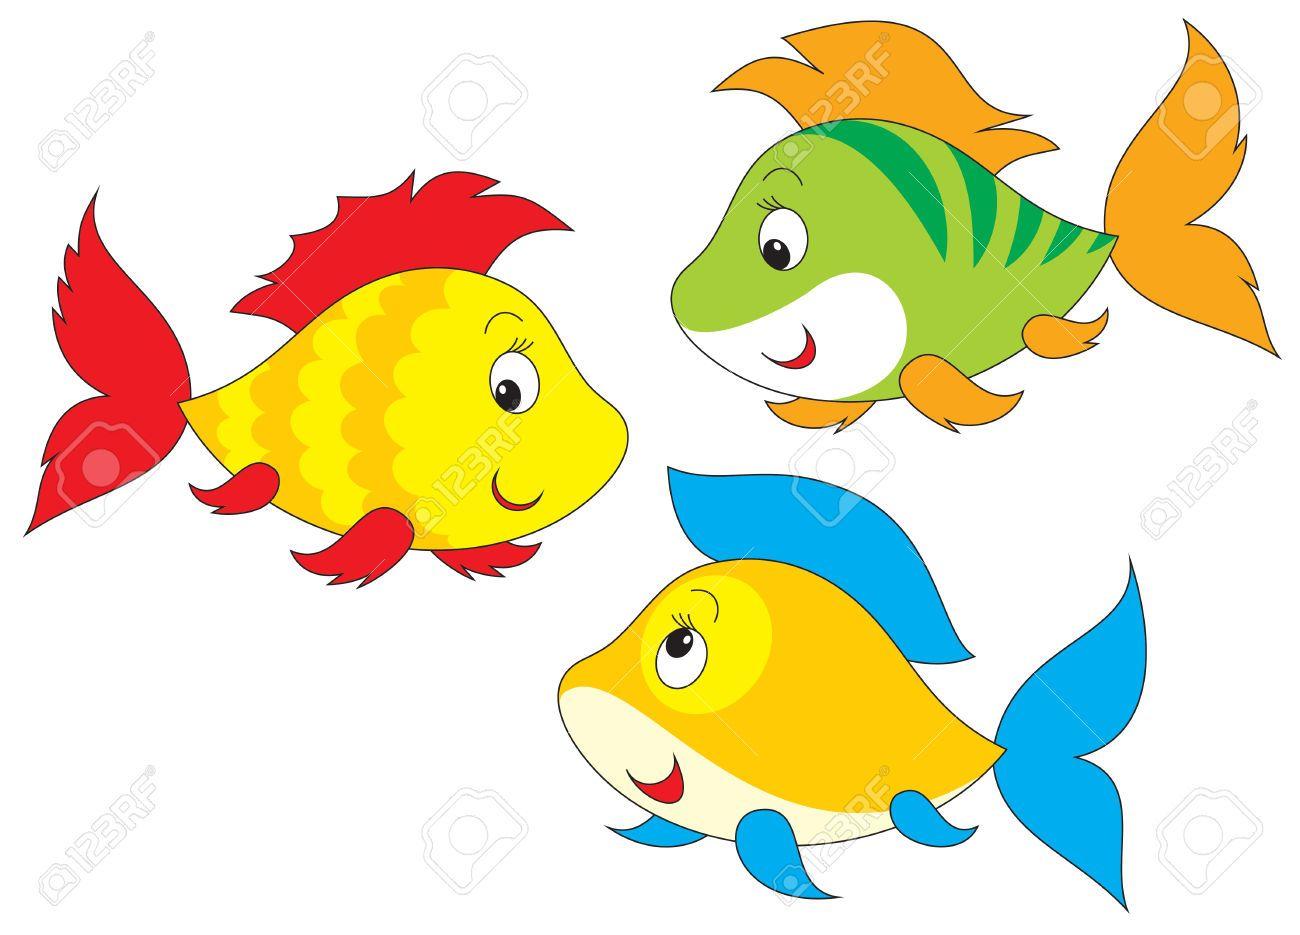 Free fish clipart 5 » Clipart Portal.